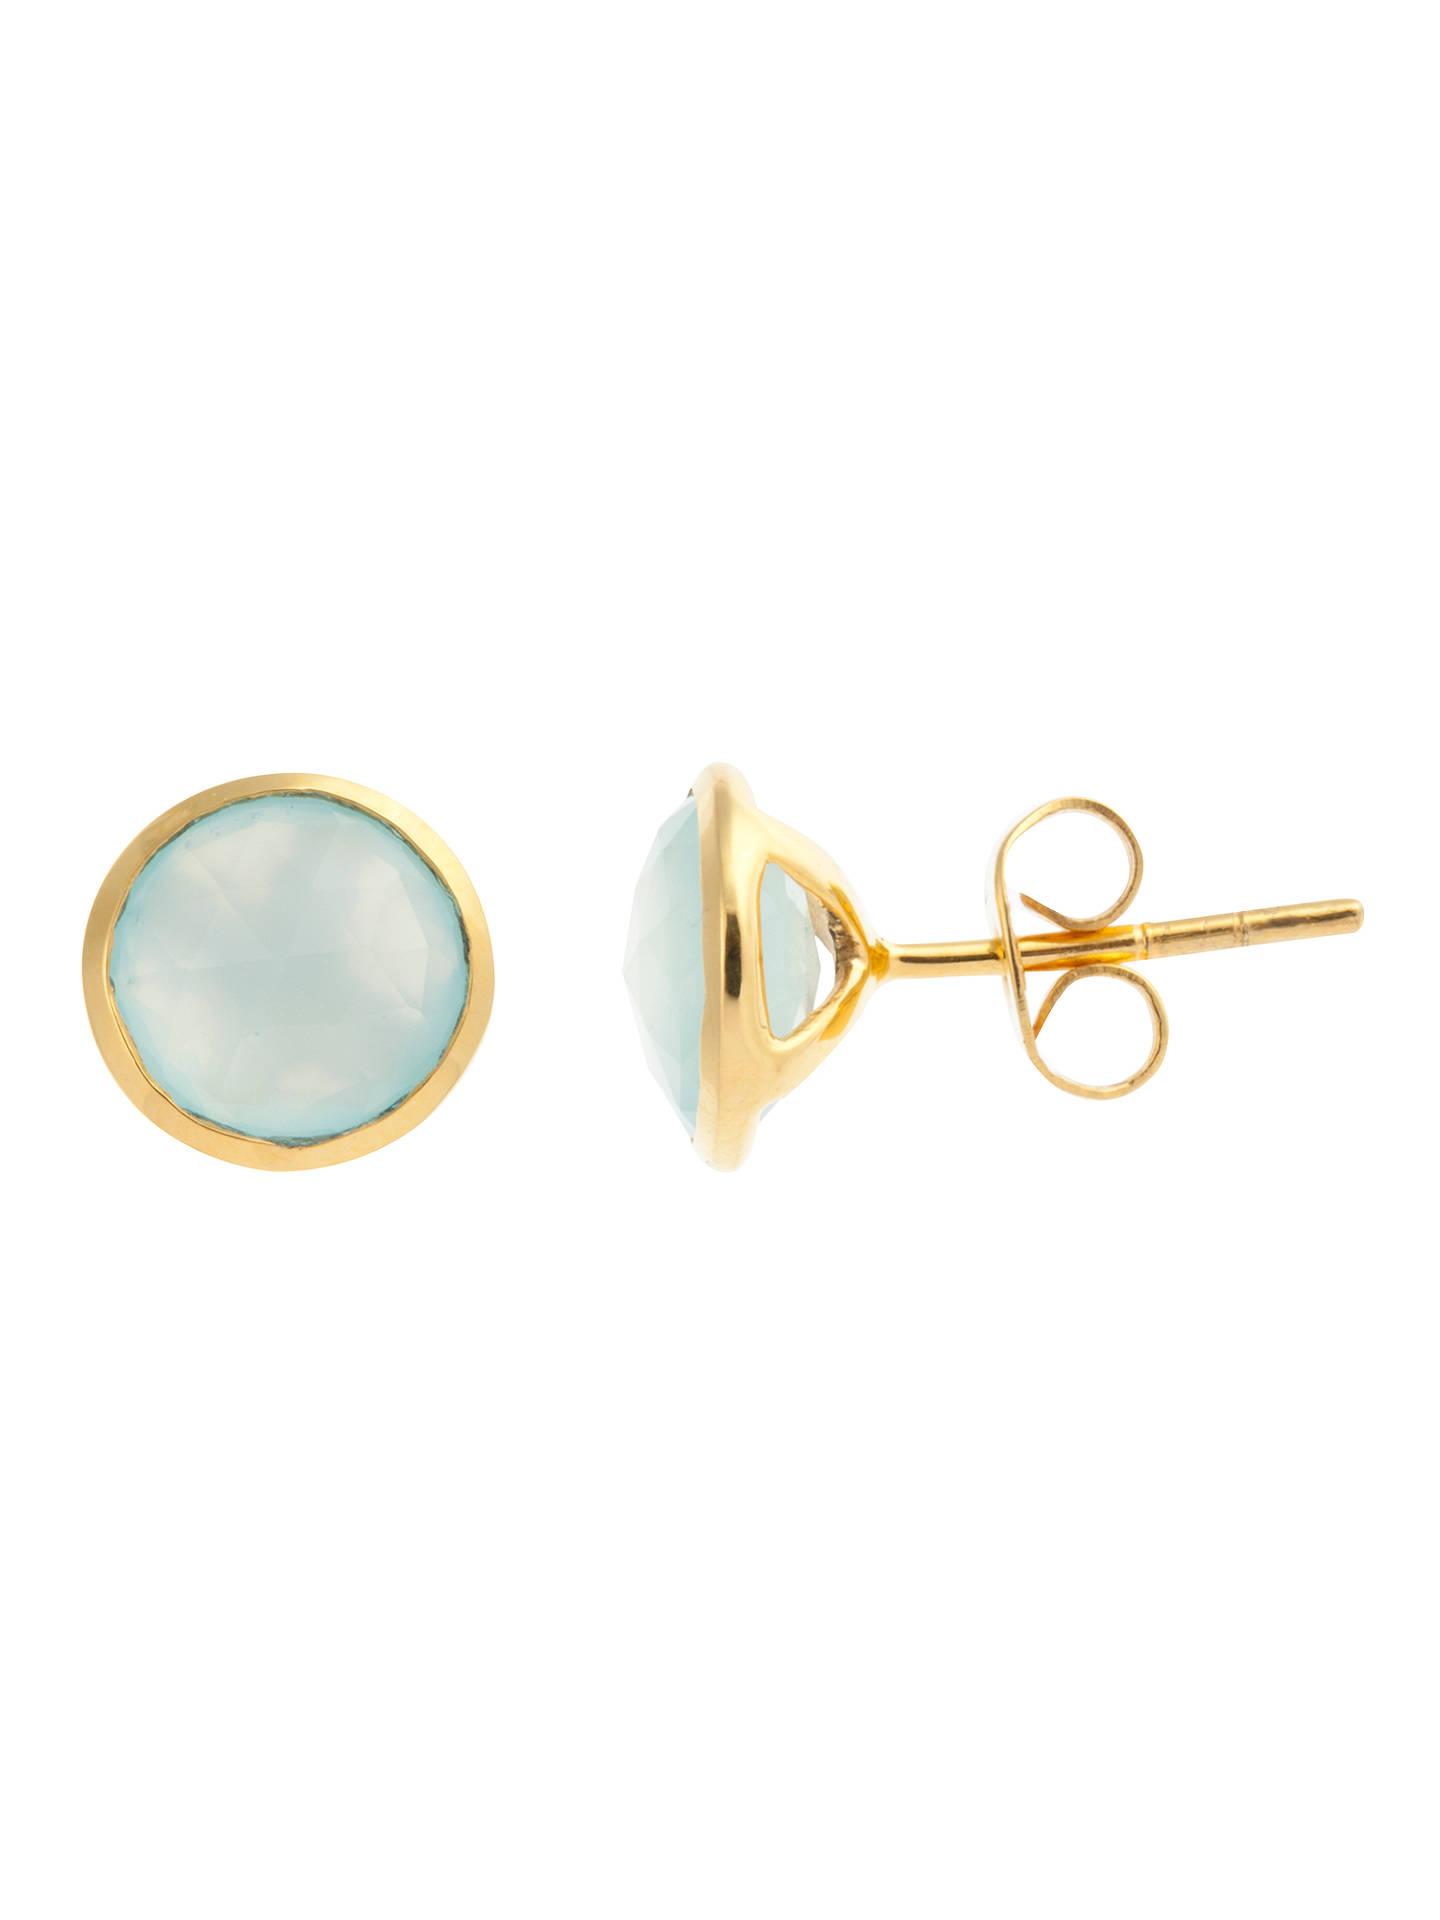 John Lewis Gemstones Chalcedony Circle Stud Earrings Aqua